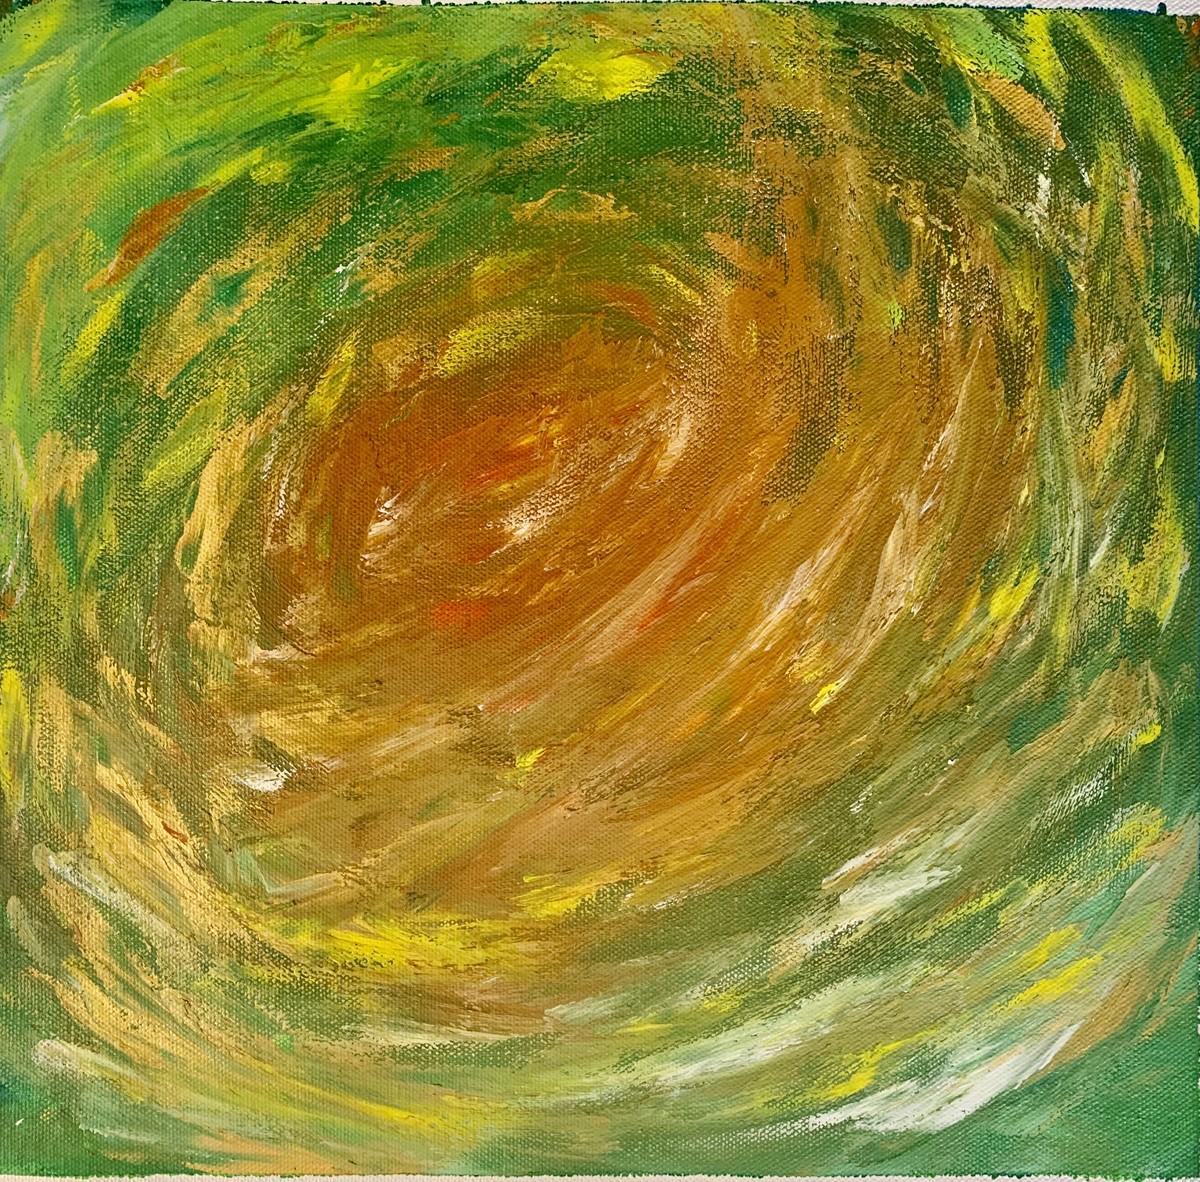 Moment of joy by Meet Thakkar, Abstract Painting, Acrylic on Canvas, Metallic Sunburst color